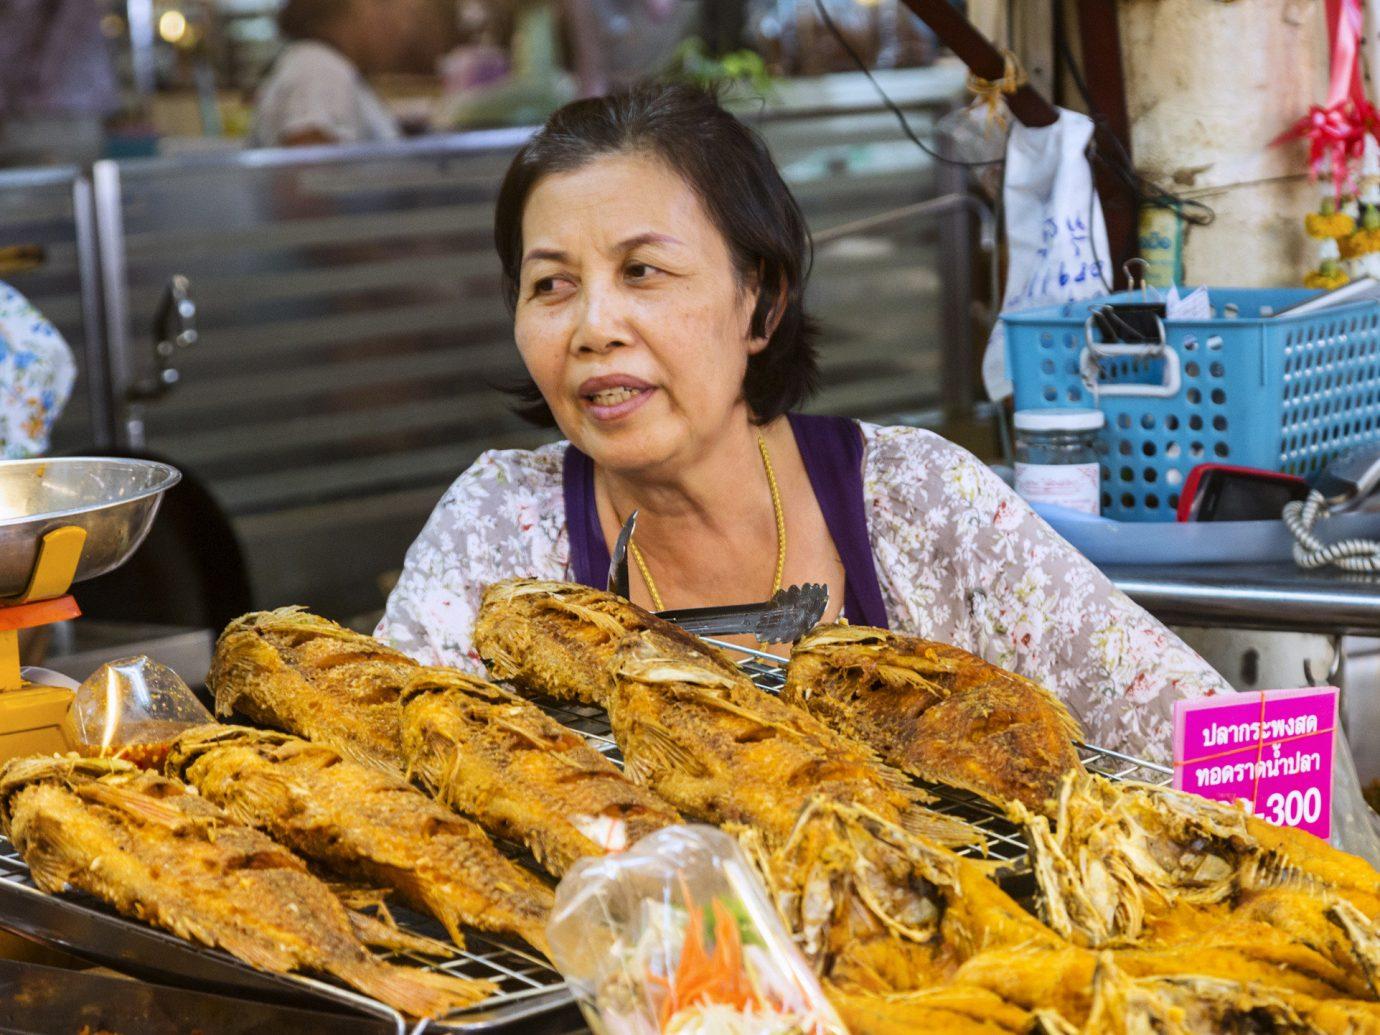 Food + Drink food person dish public space meal Seafood fish market street food cuisine sense asian food snack food